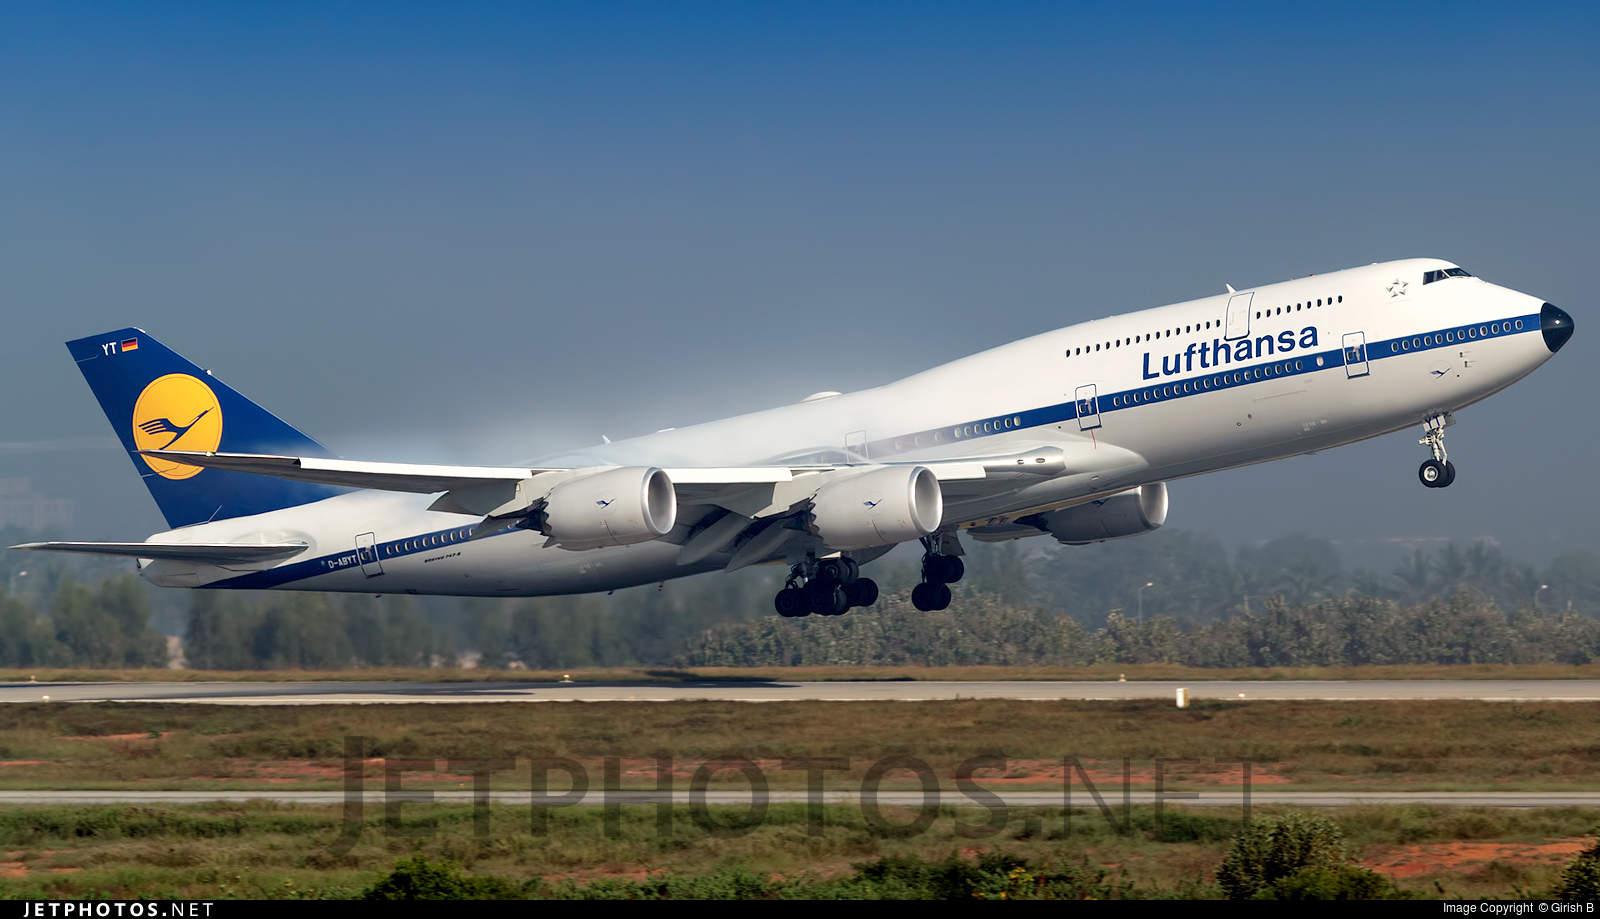 Lufthansa CFO resigns